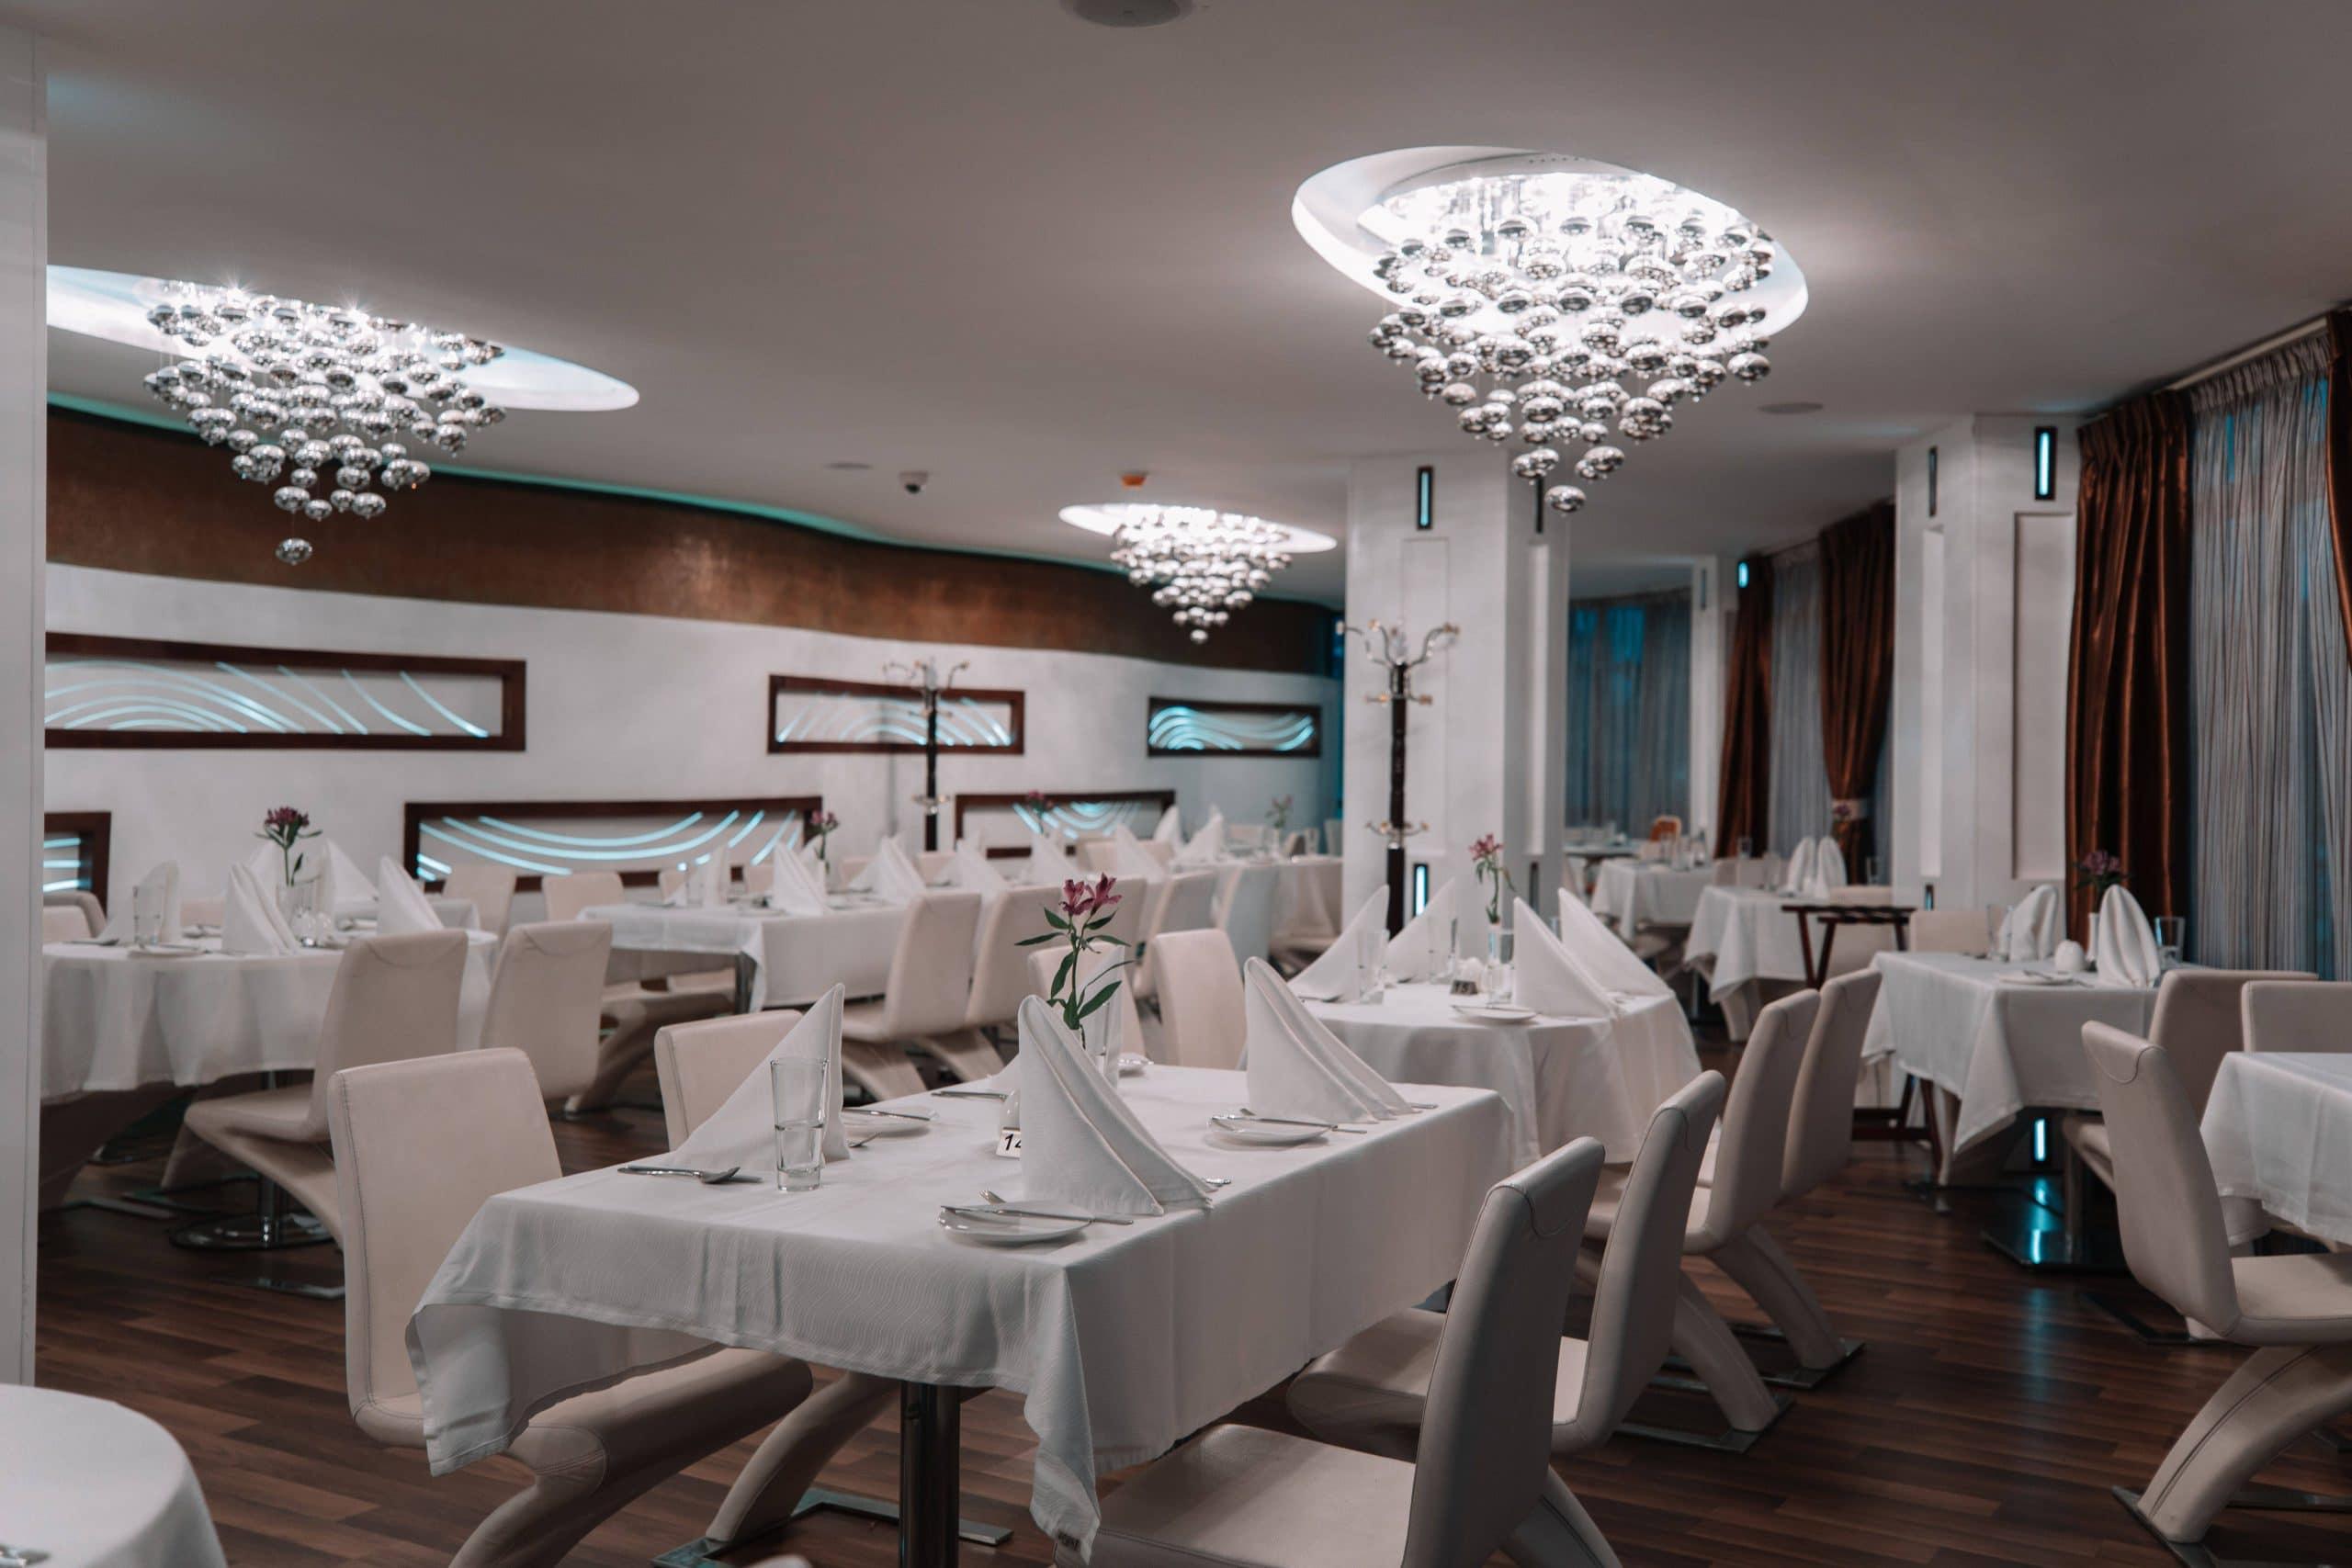 Our Luxury Restaurant